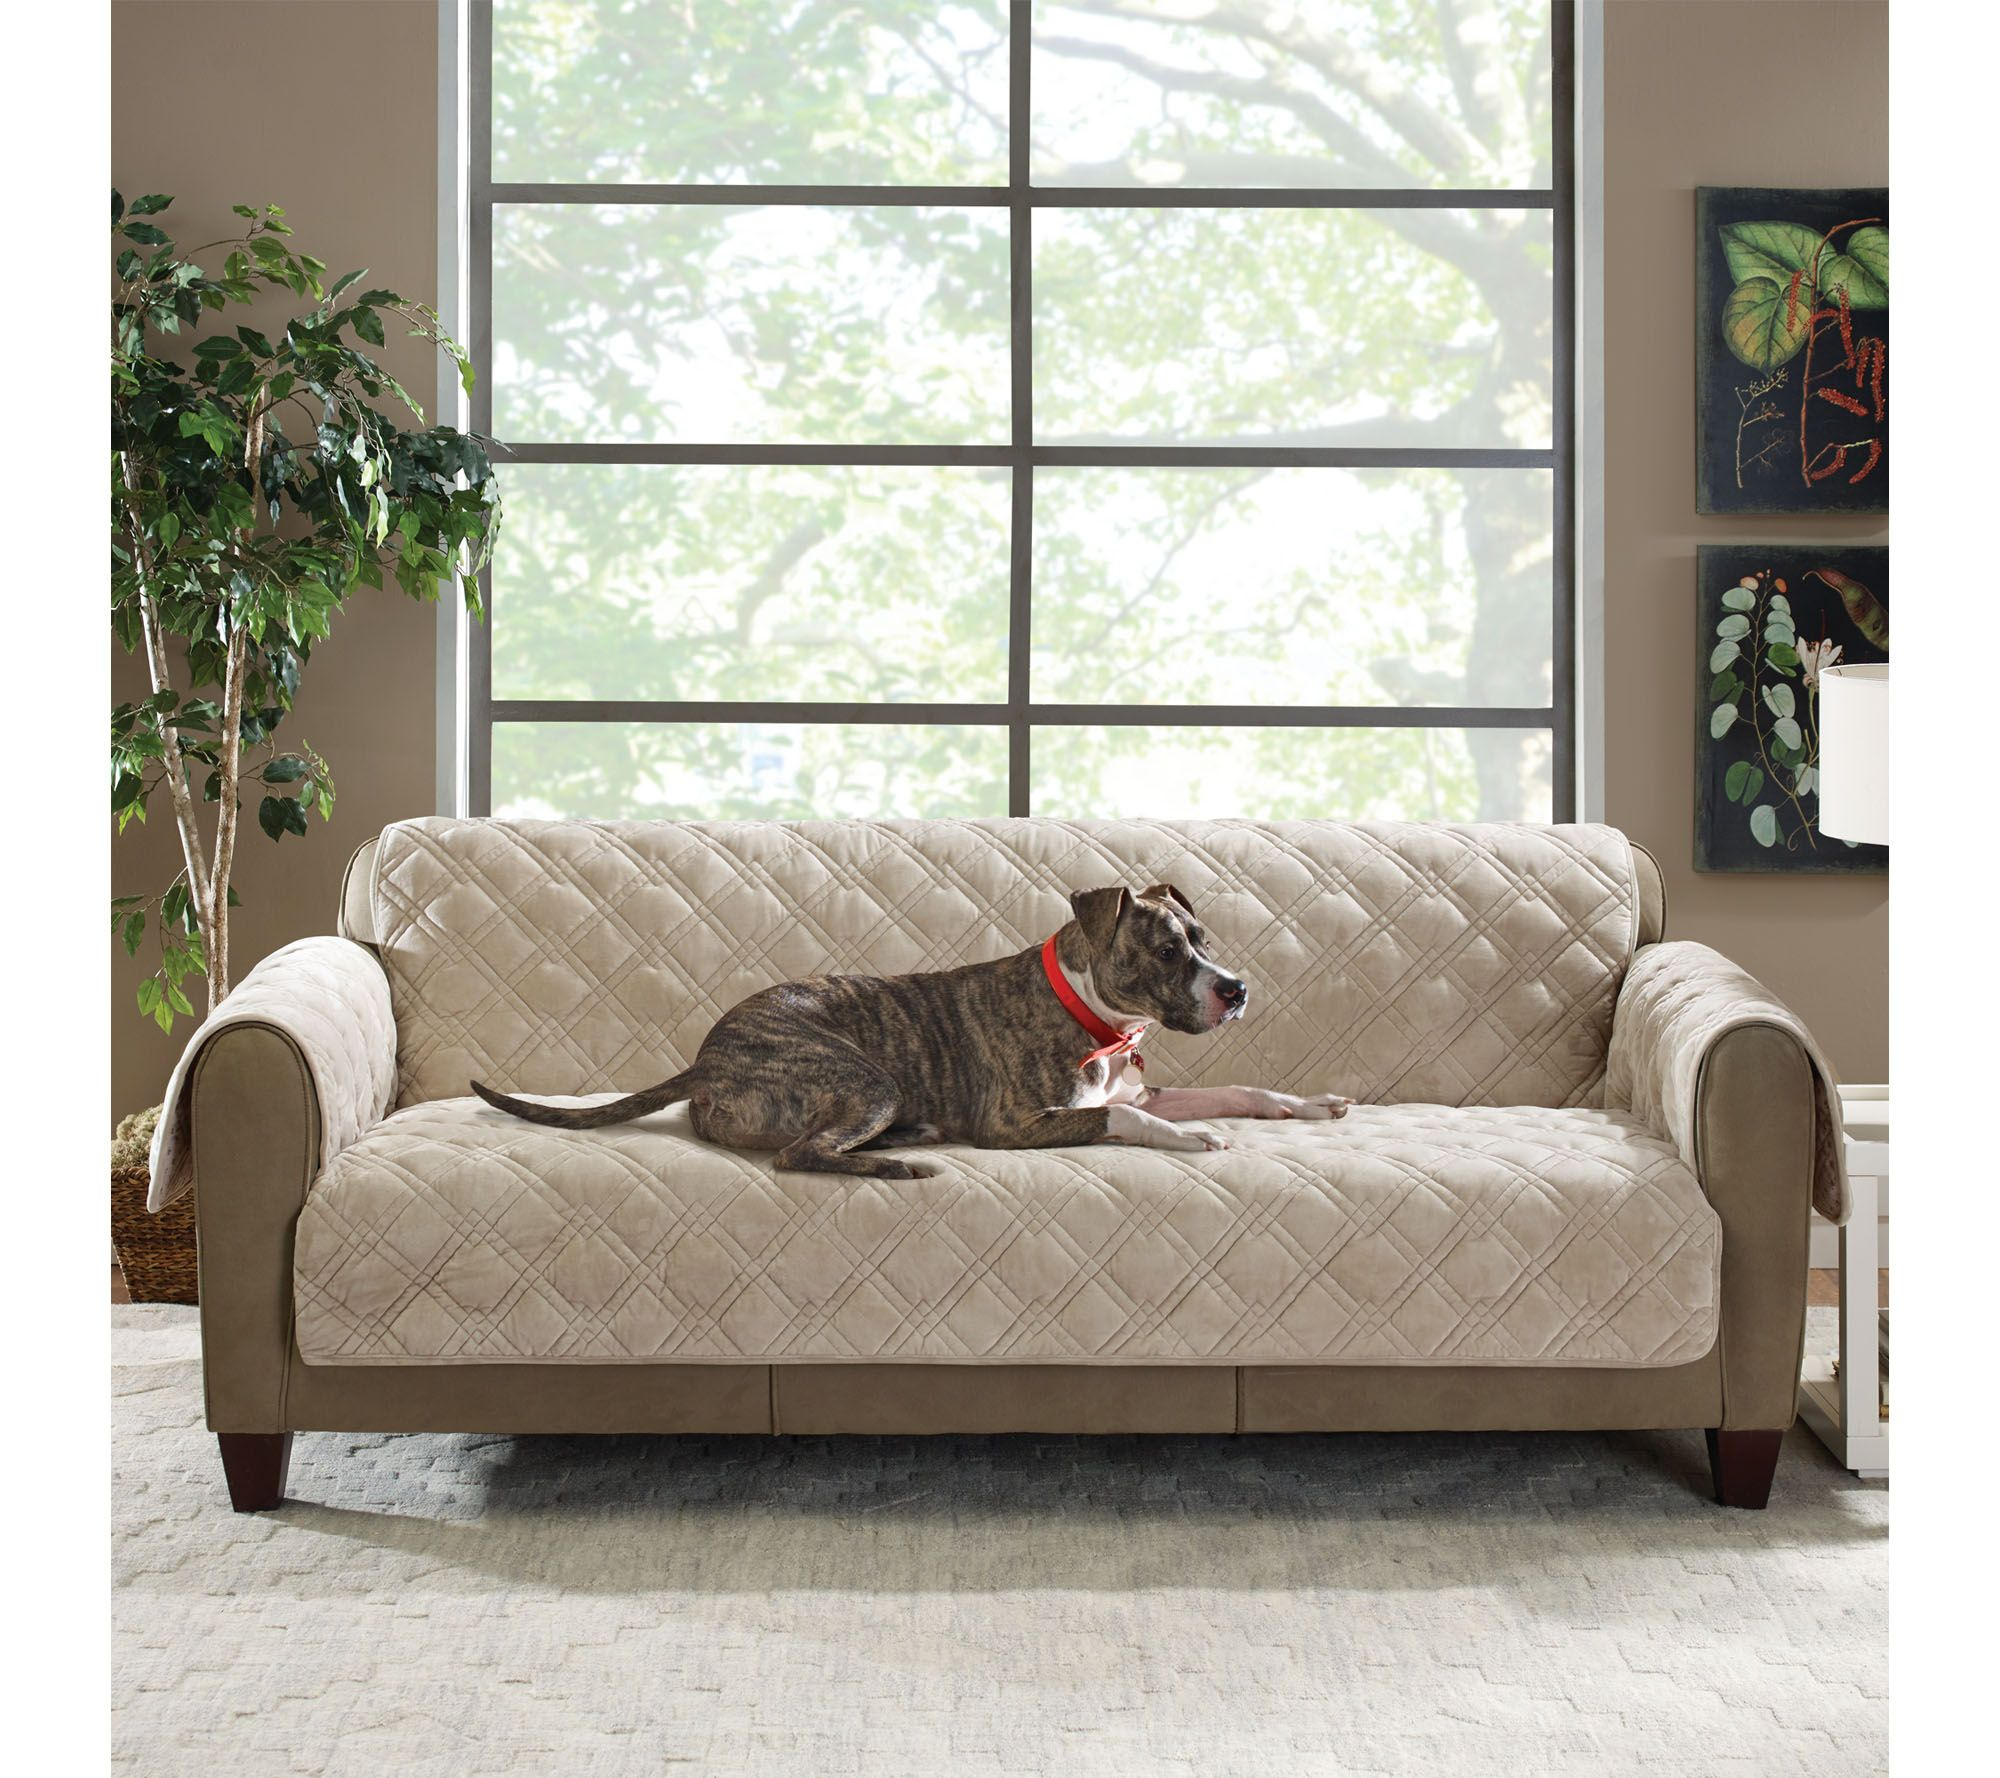 Sure Fit Plush fort Sofa Furniture Cover Pockets & Non Skid